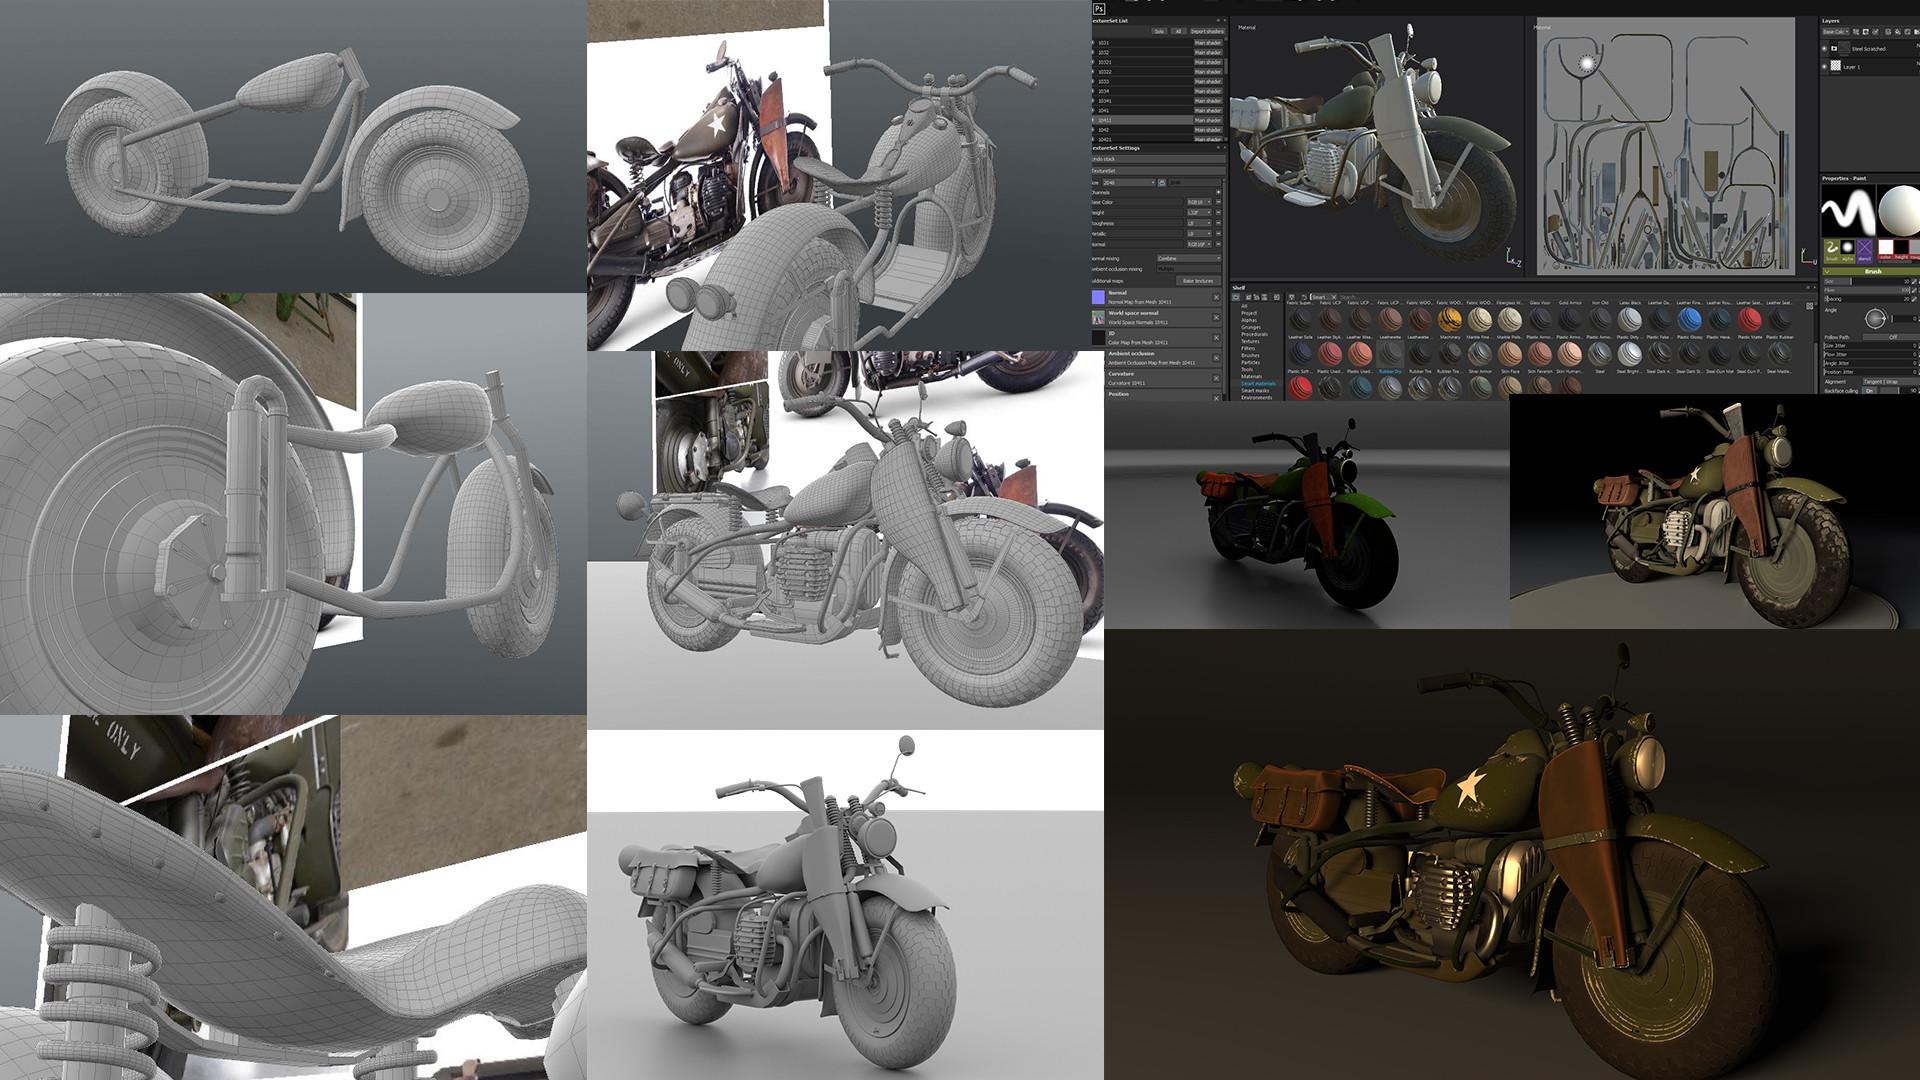 ArtStation - Harley Davidson 750cc XA Military Motorcycle